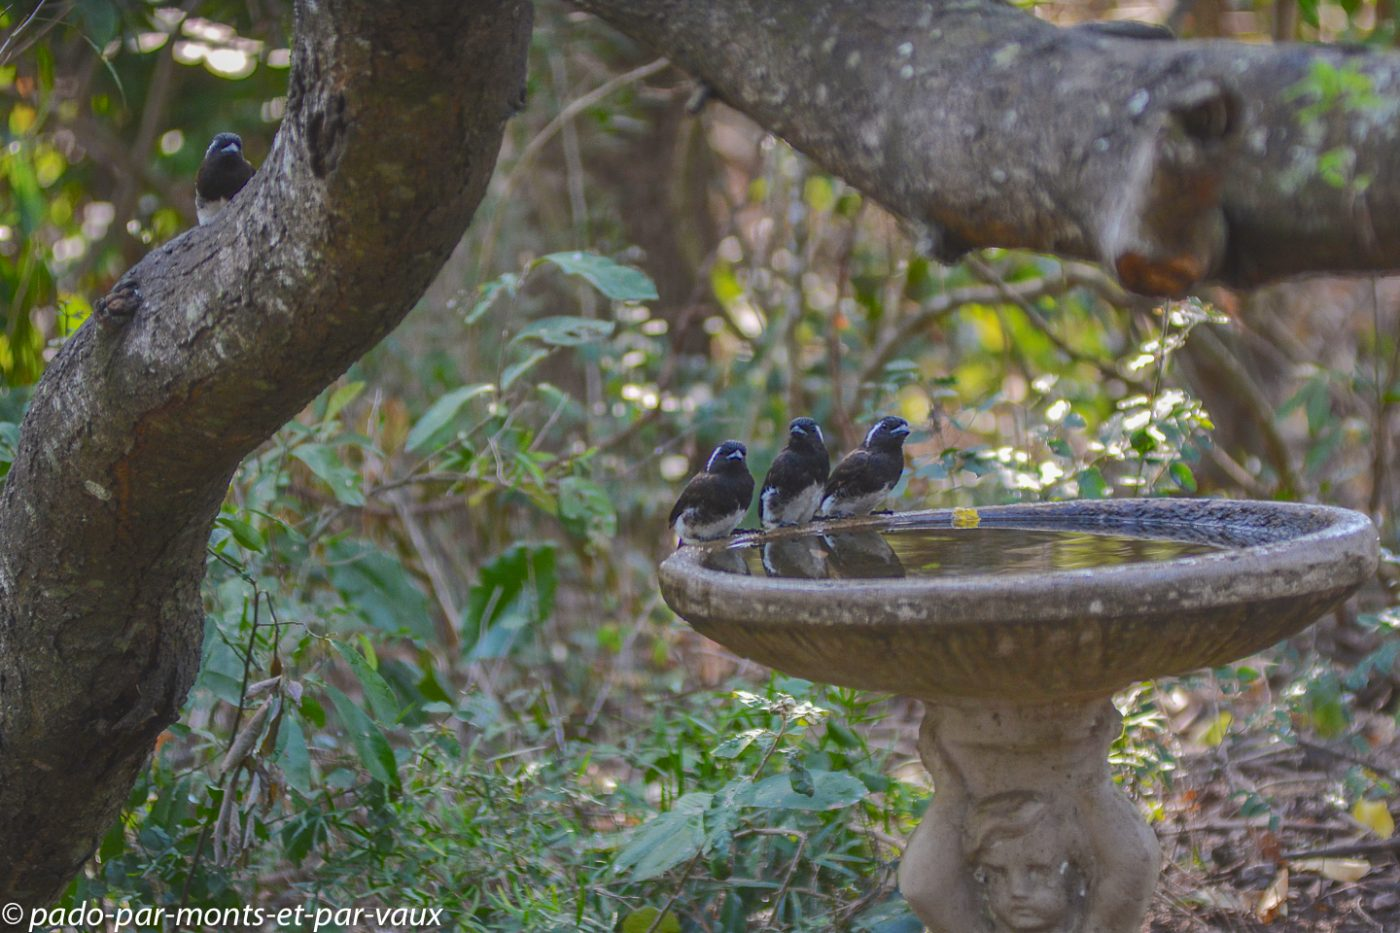 Santa Lucia Wetland park - Barbicans oreillards